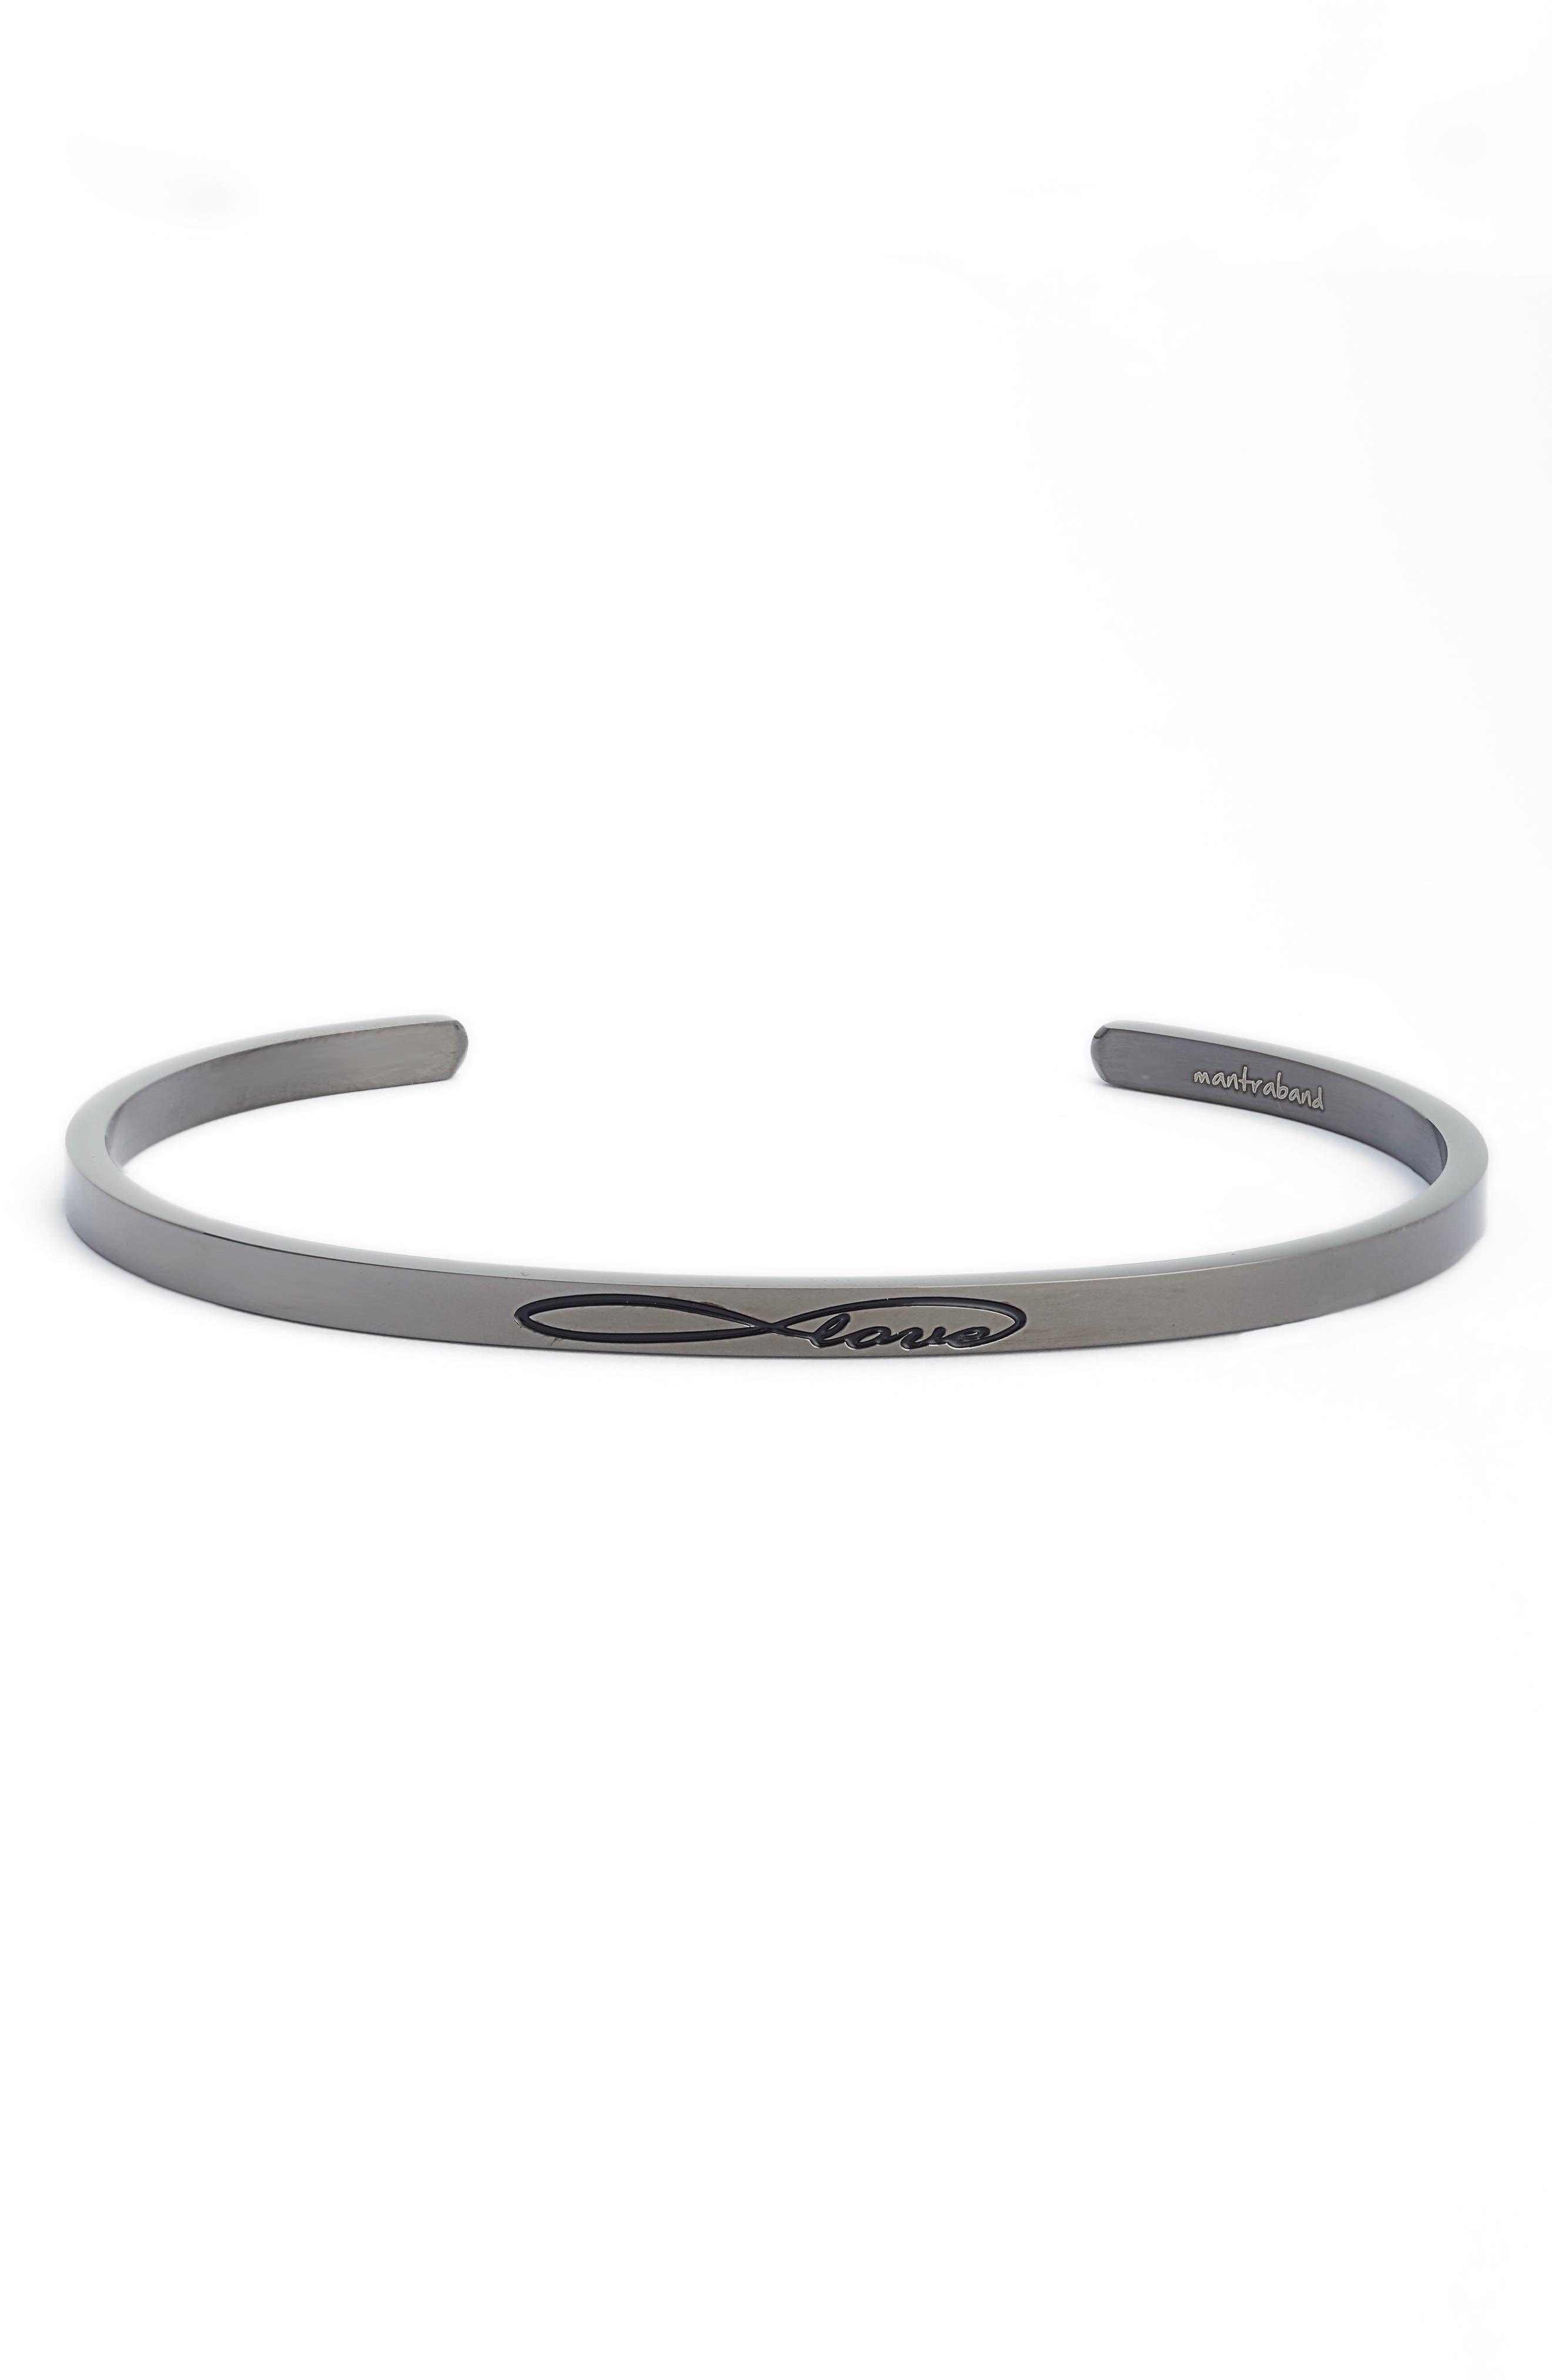 MantraBand® Infinite Love Cuff Bracelet